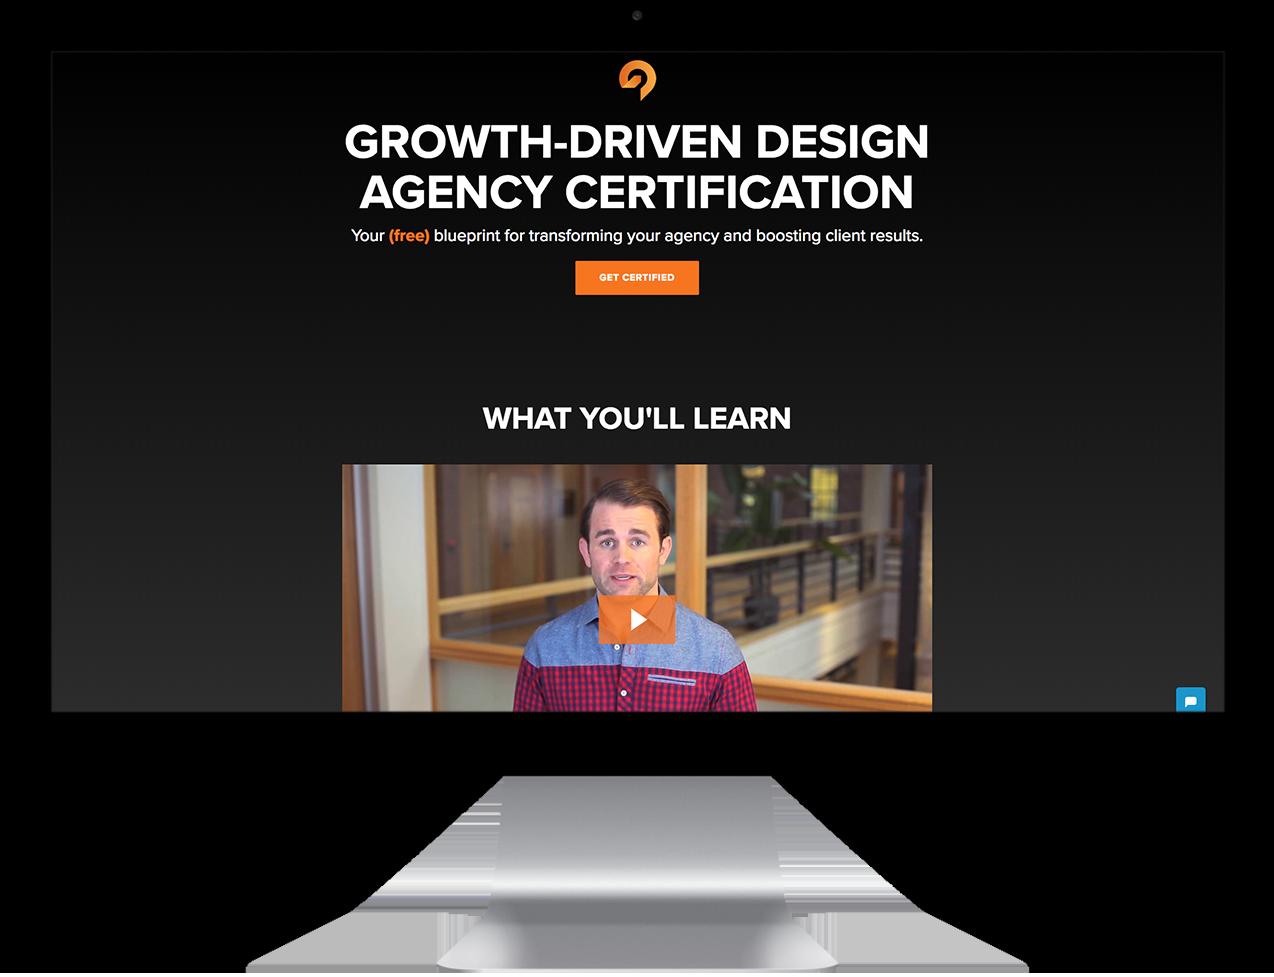 growth-driven-design-desktop-02